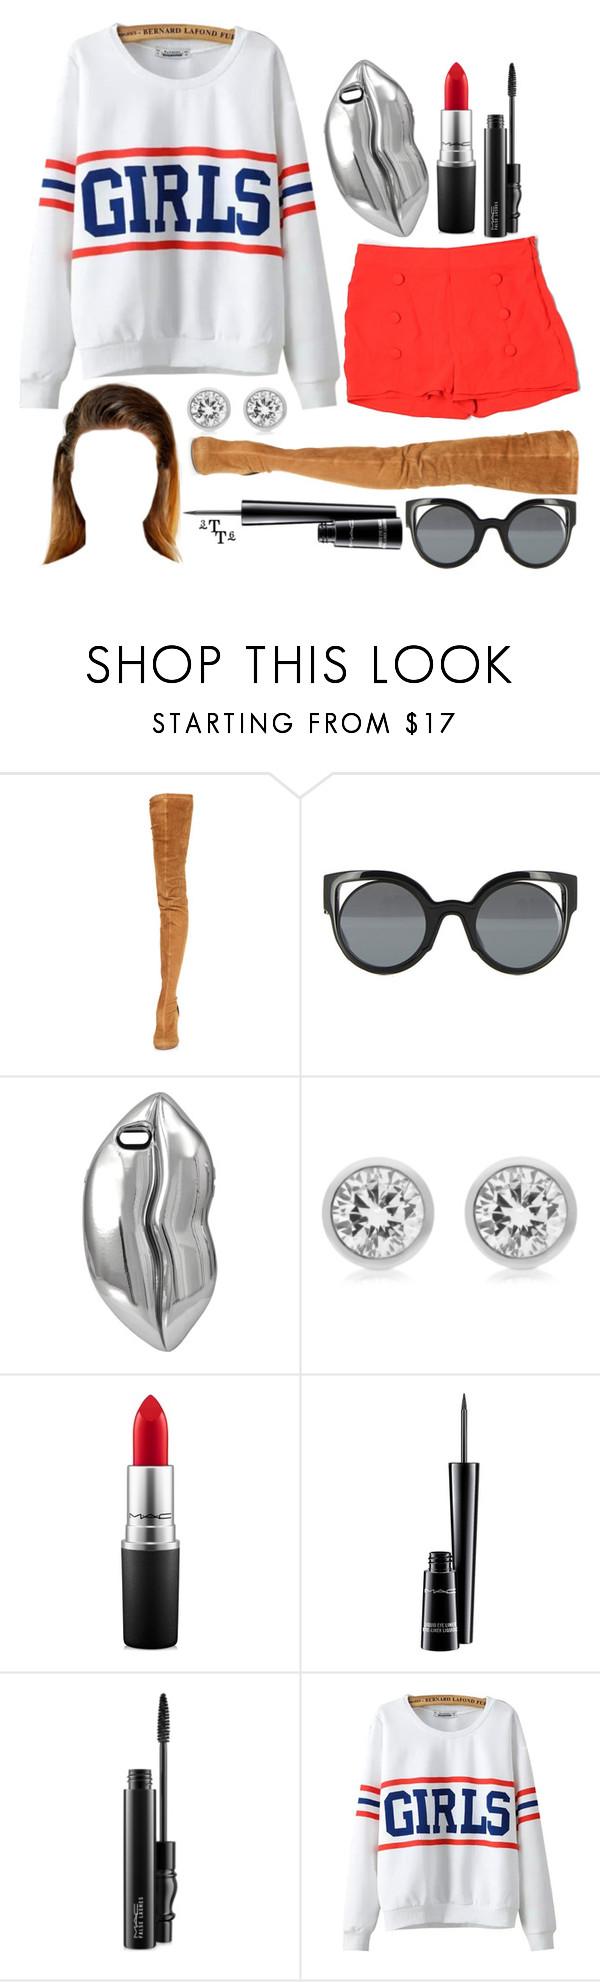 """Dream style 3"" by triple-threat36 ❤ liked on Polyvore featuring Maison Margiela, Fendi, STELLA McCARTNEY, Michael Kors, MAC Cosmetics, Chicnova Fashion and Moon Collection"